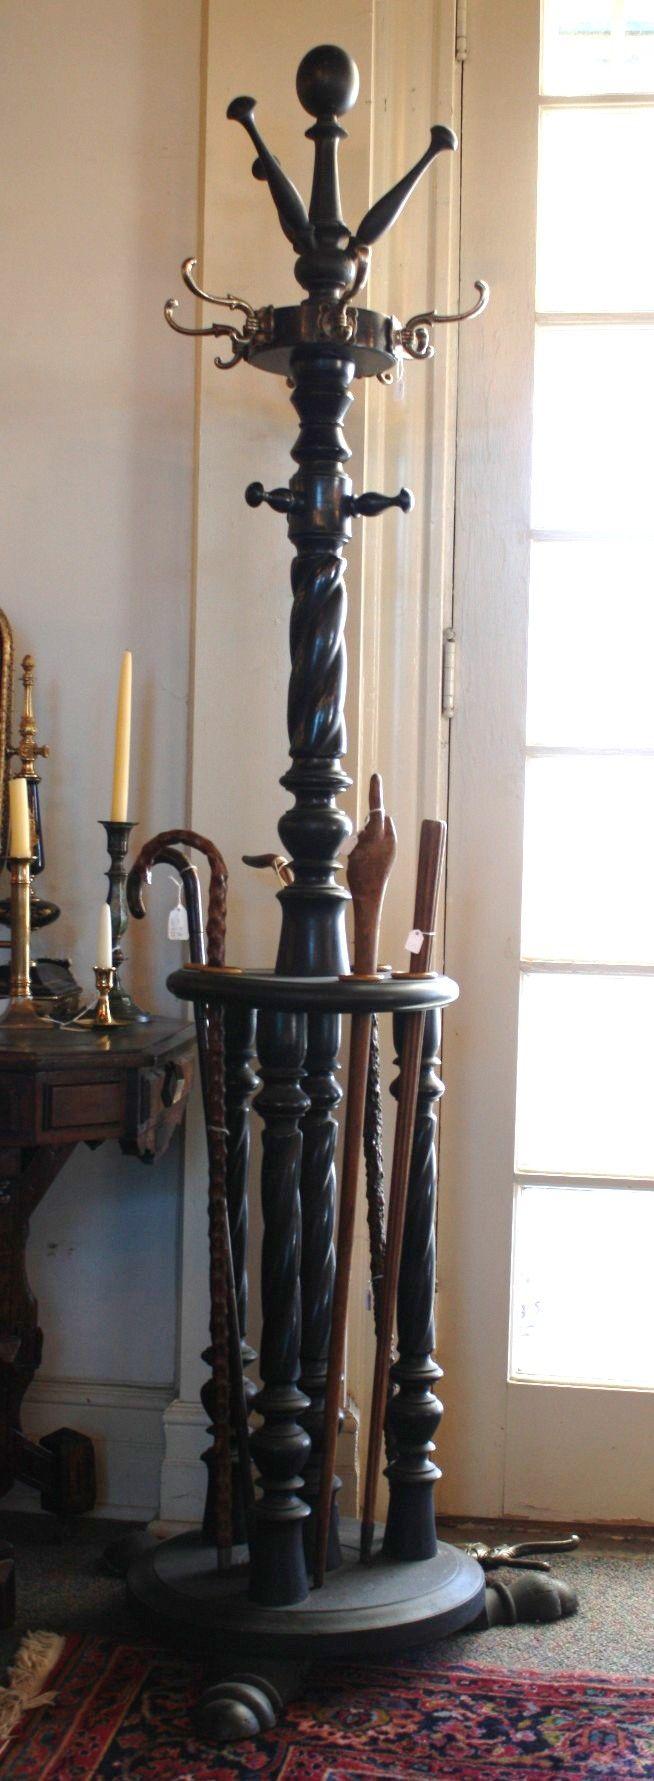 Hall Tree Coat Rack iron antique | Antique Coat Tree For Sale | Antiques.com…